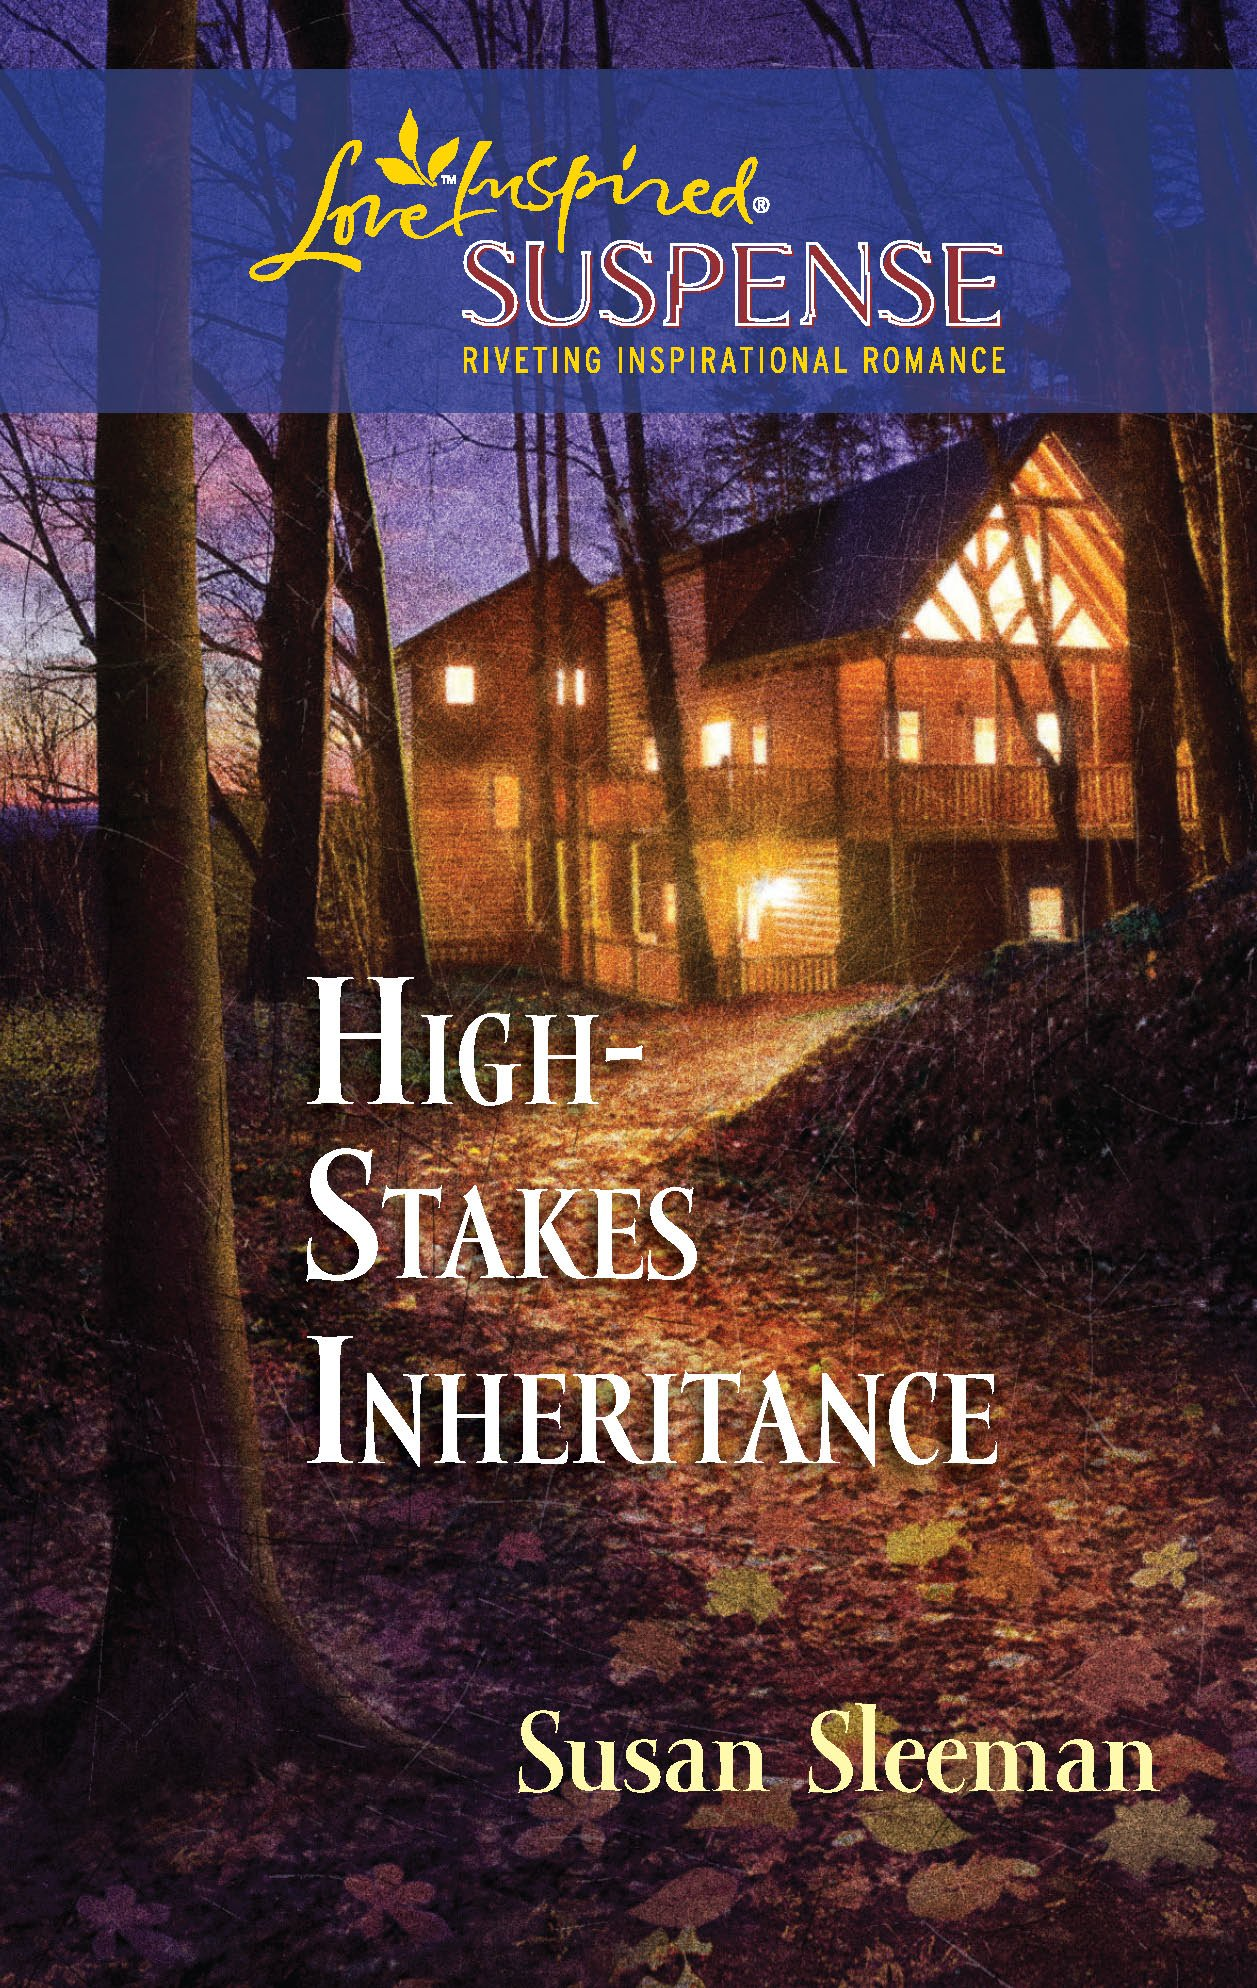 High-Stakes Inheritance (Love Inspired Suspense) ePub fb2 book